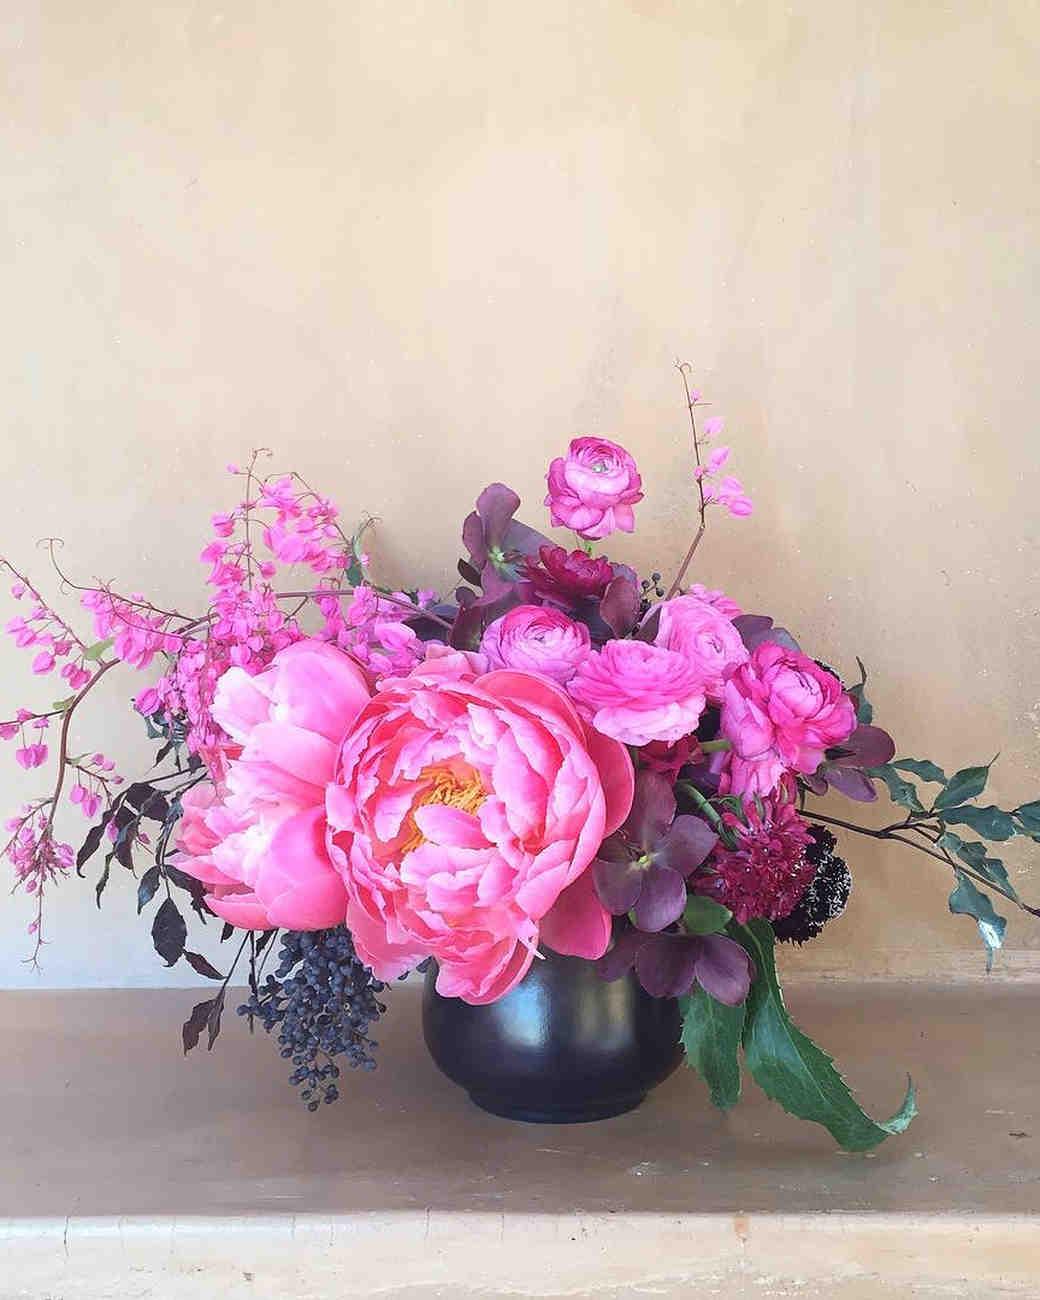 instagram-photos-mexico-flower-arrangement-0716.jpg